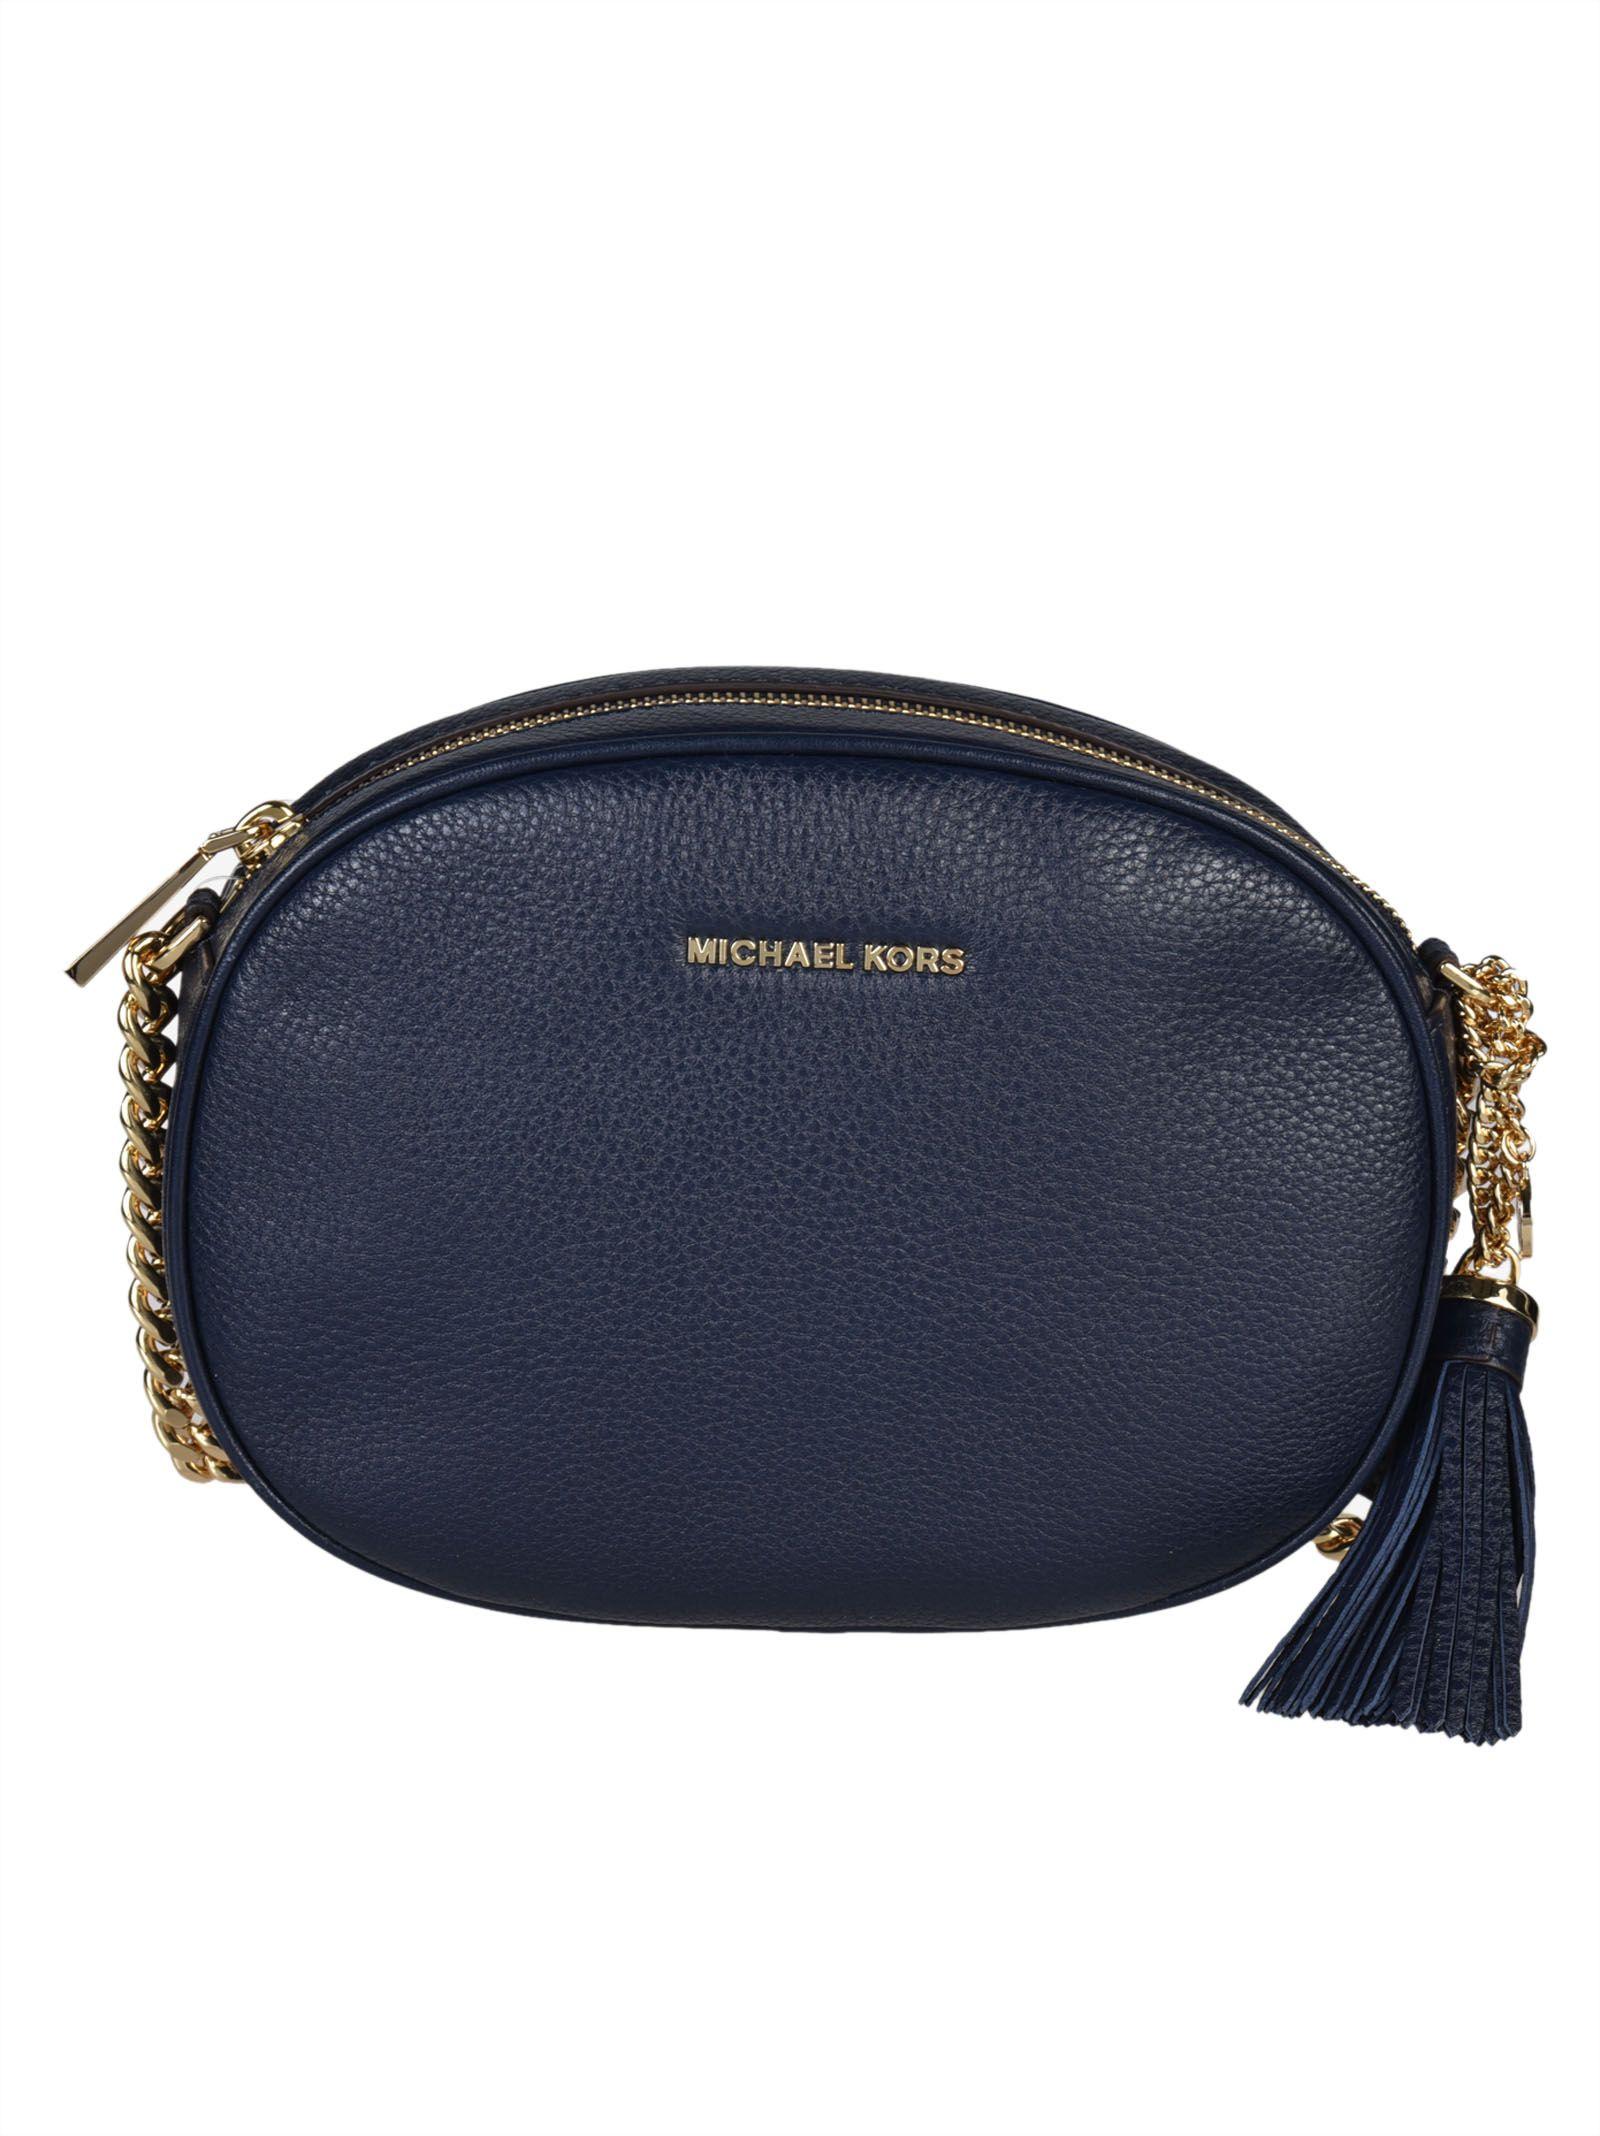 47414ee79d78 Michael Kors Michael Kors Ginny Medium Messenger Shoulder Bag ...